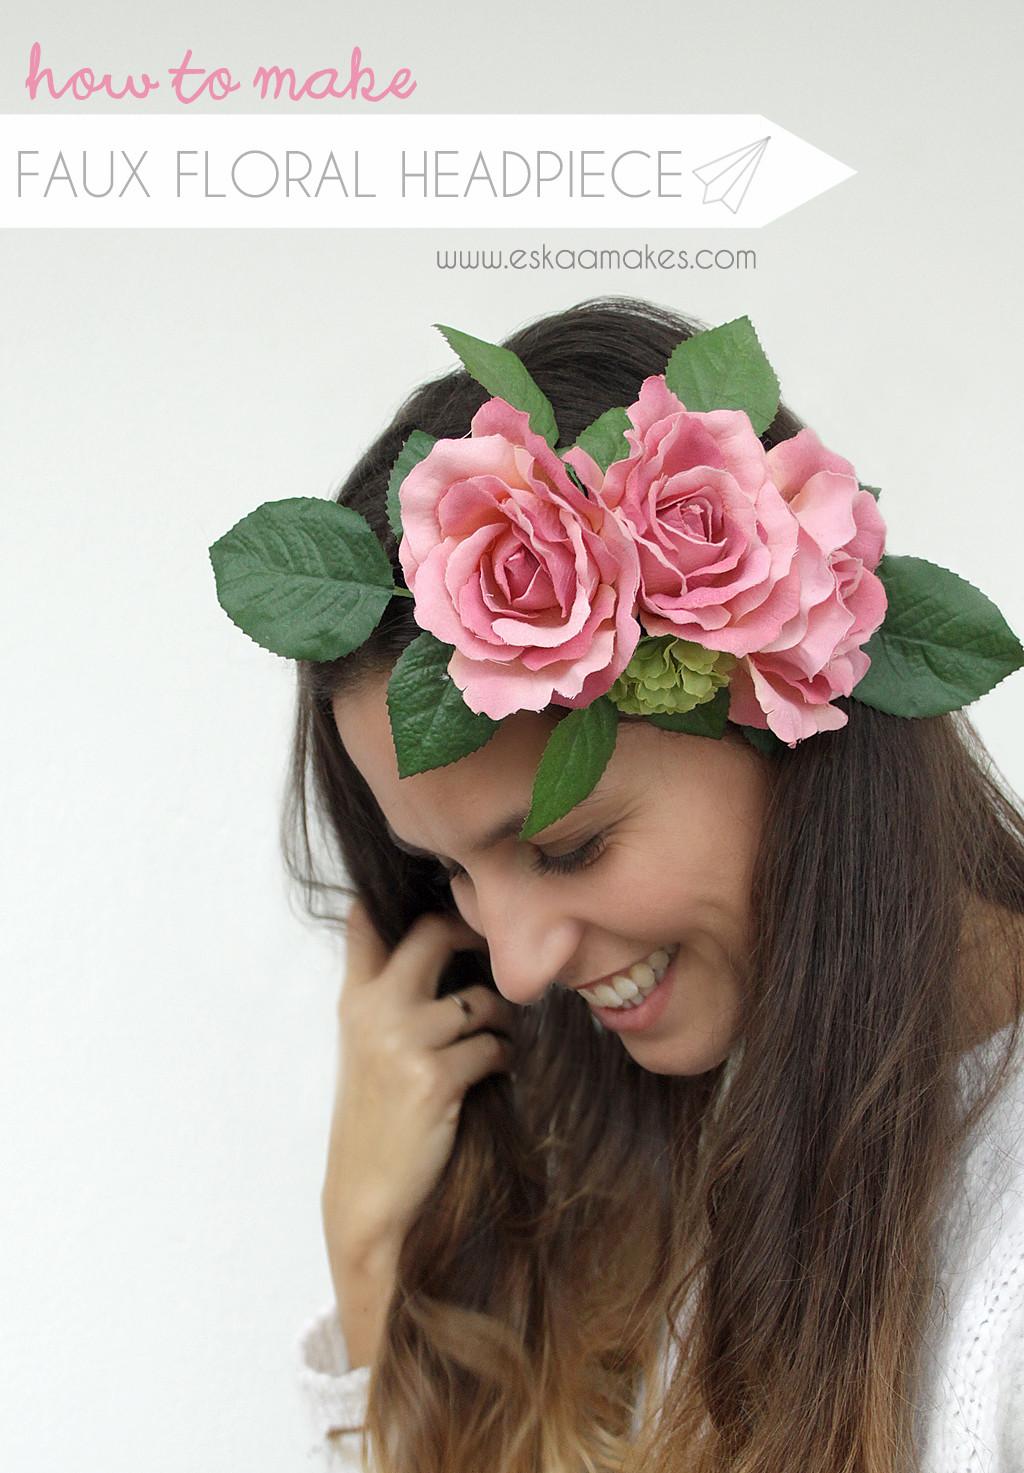 DIY Wedding Headpieces  How to make faux floral headpiece [es kaa ] makes